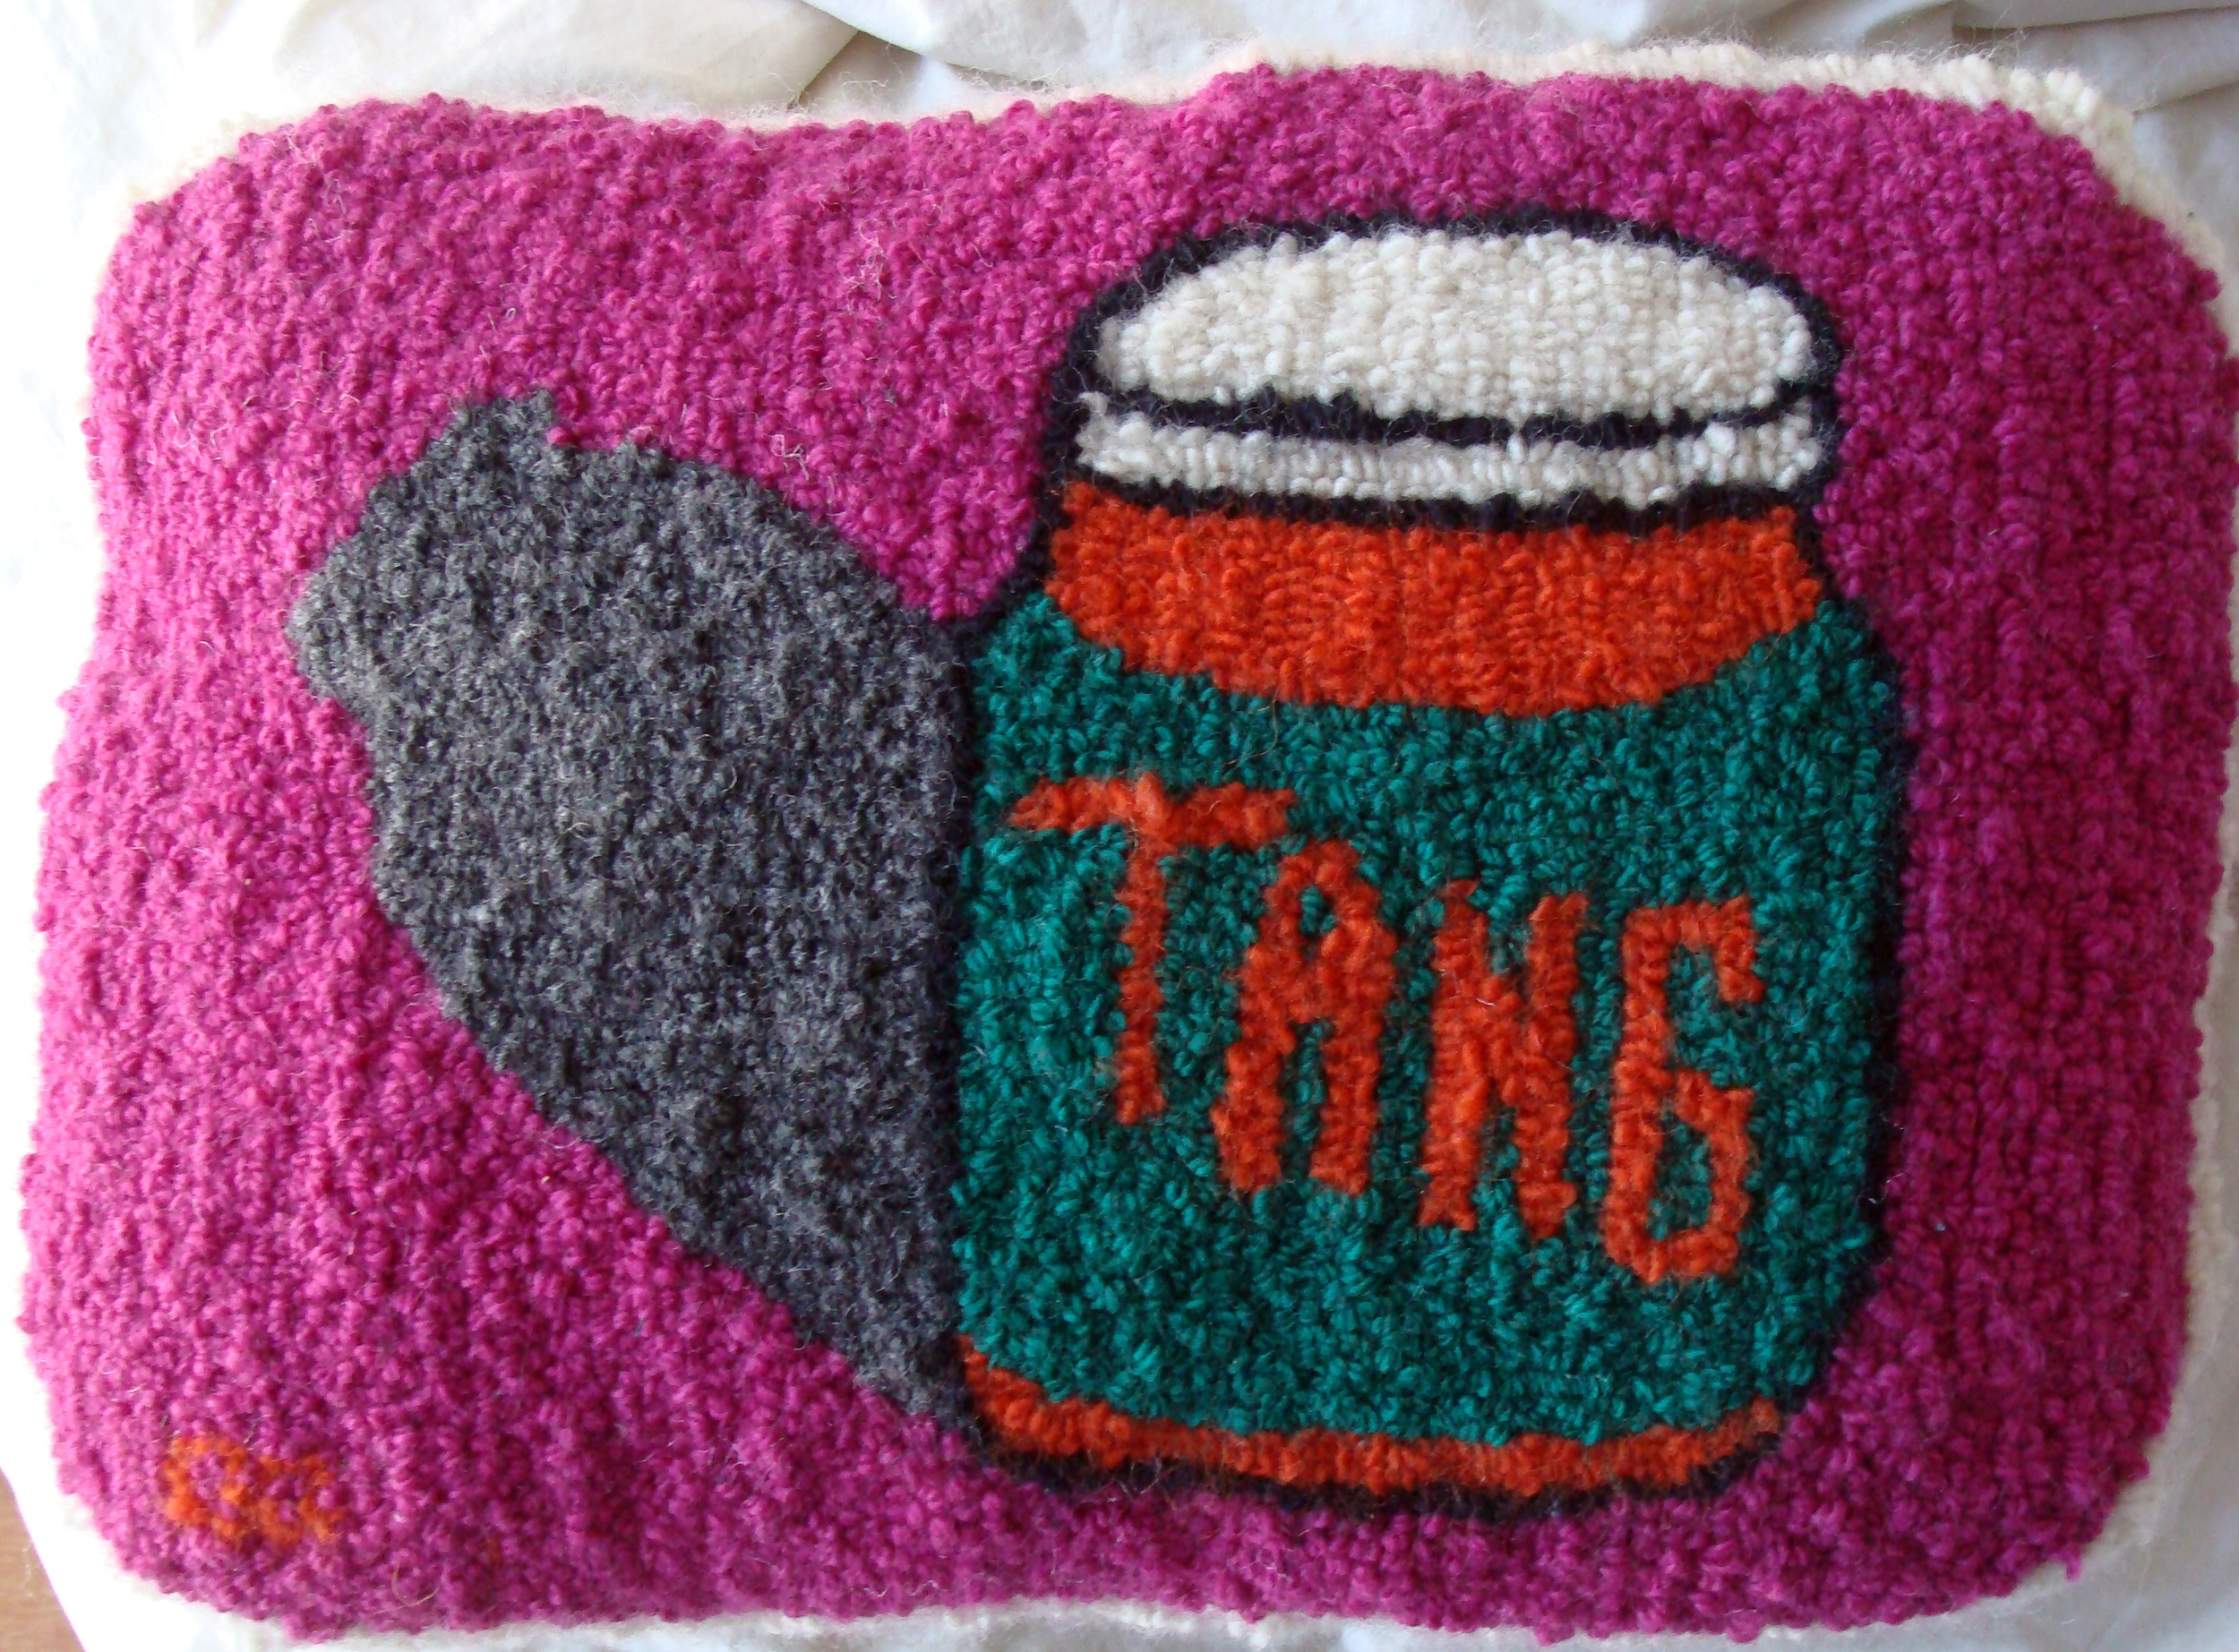 Tang hand-hooked pillow